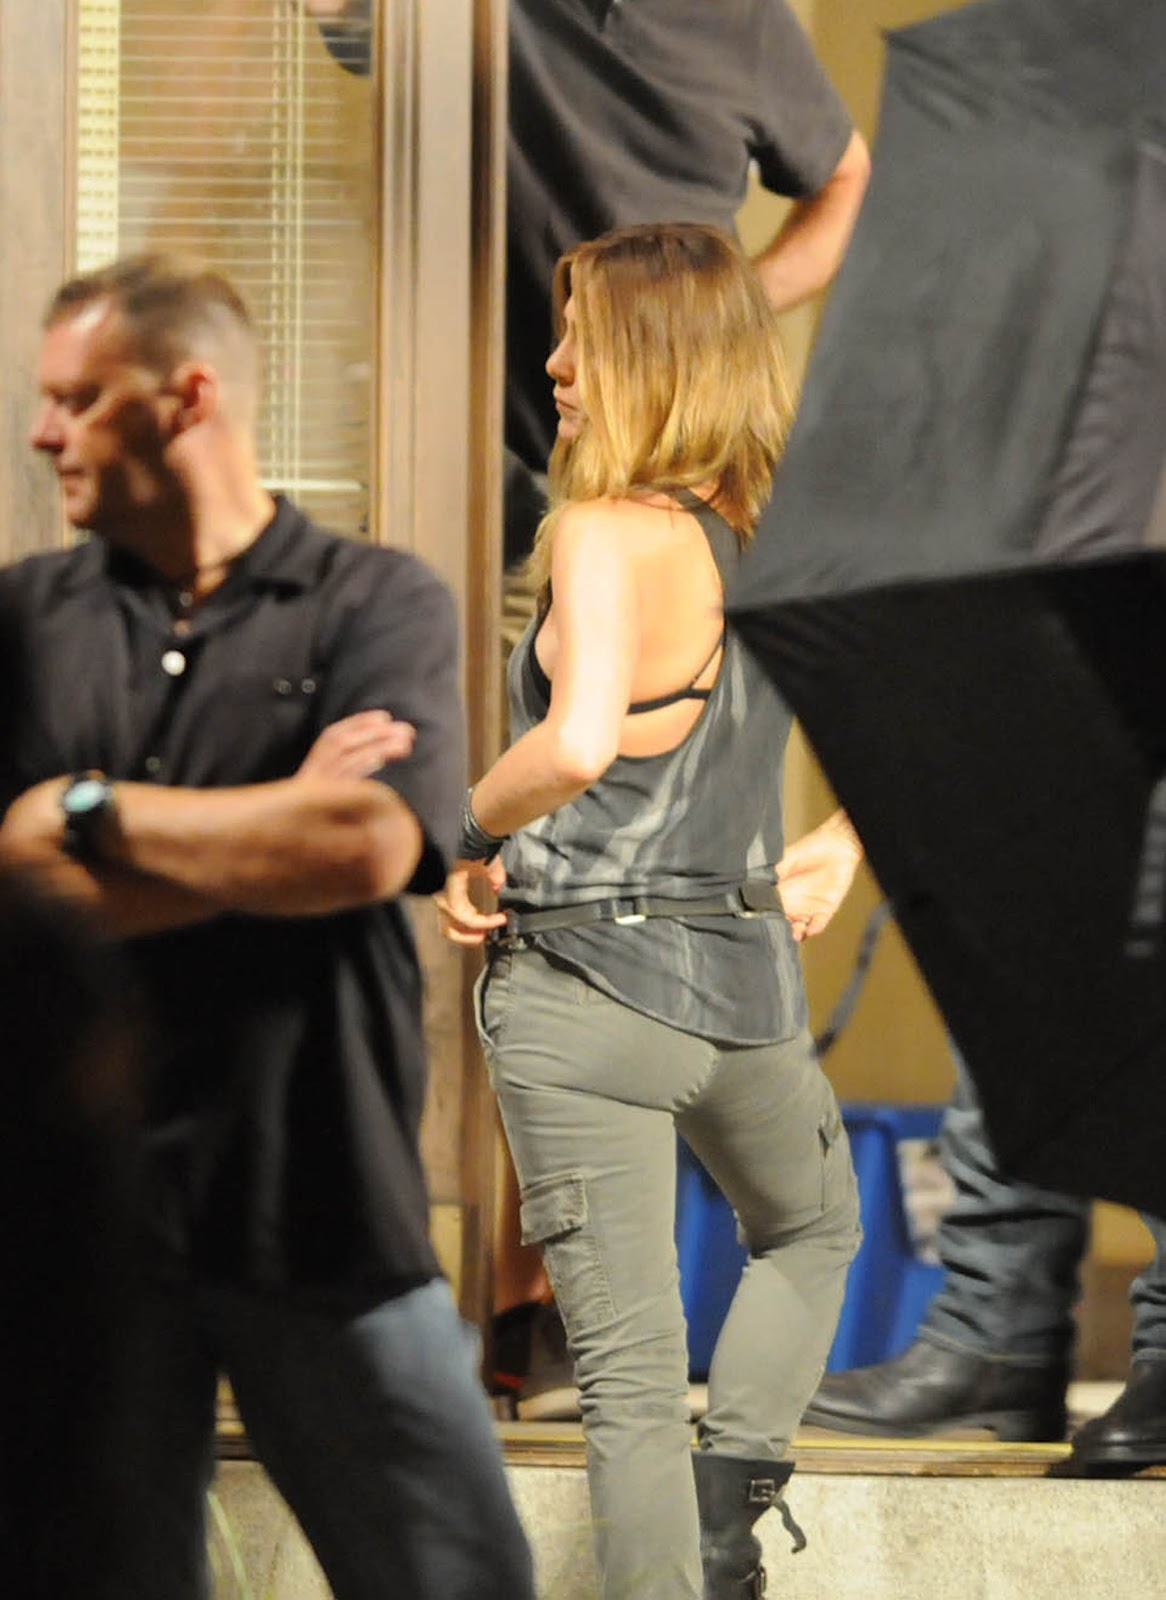 http://1.bp.blogspot.com/-mc52tfvEmyo/UCgJM2GyXQI/AAAAAAAAXX4/4WIhbywf3lo/s1600/Jennifer+Aniston+in+Tight+Jeans+-+On+the+set+of+We\'re+the+Millers+in+Wilmington+August+7,++2012+01.jpg